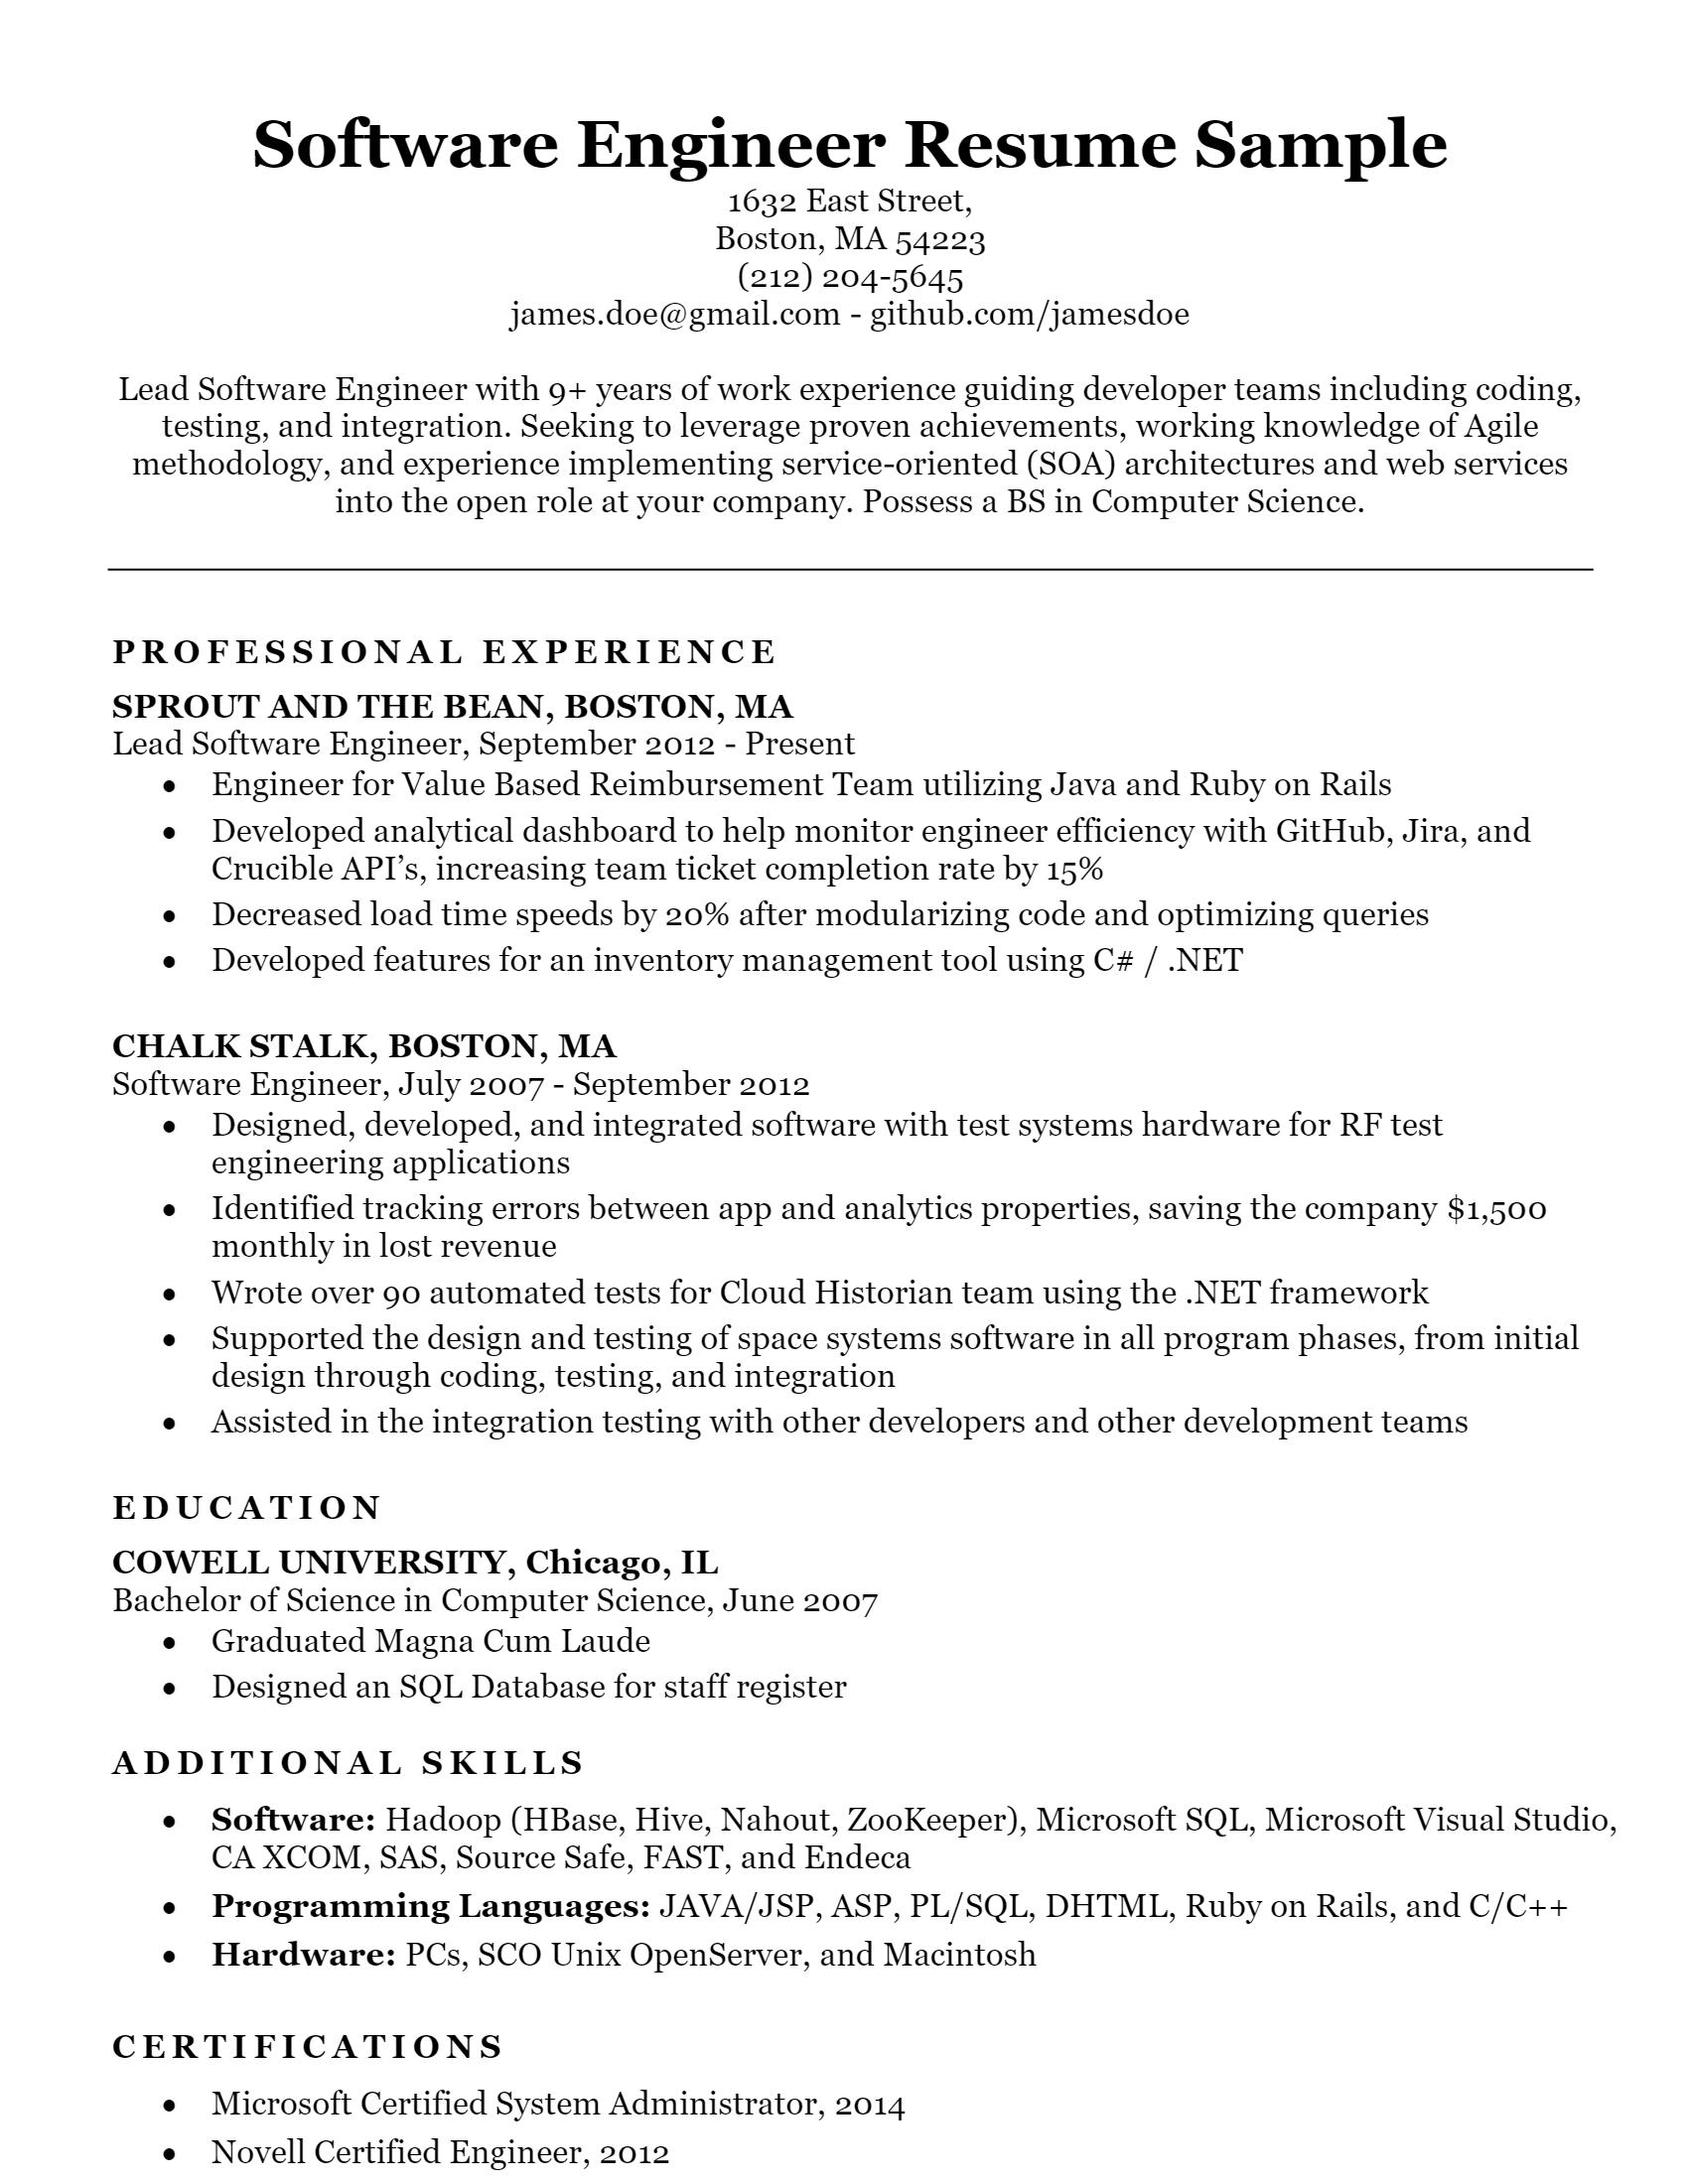 Software Engineer > Software Engineer .Docx (Word)